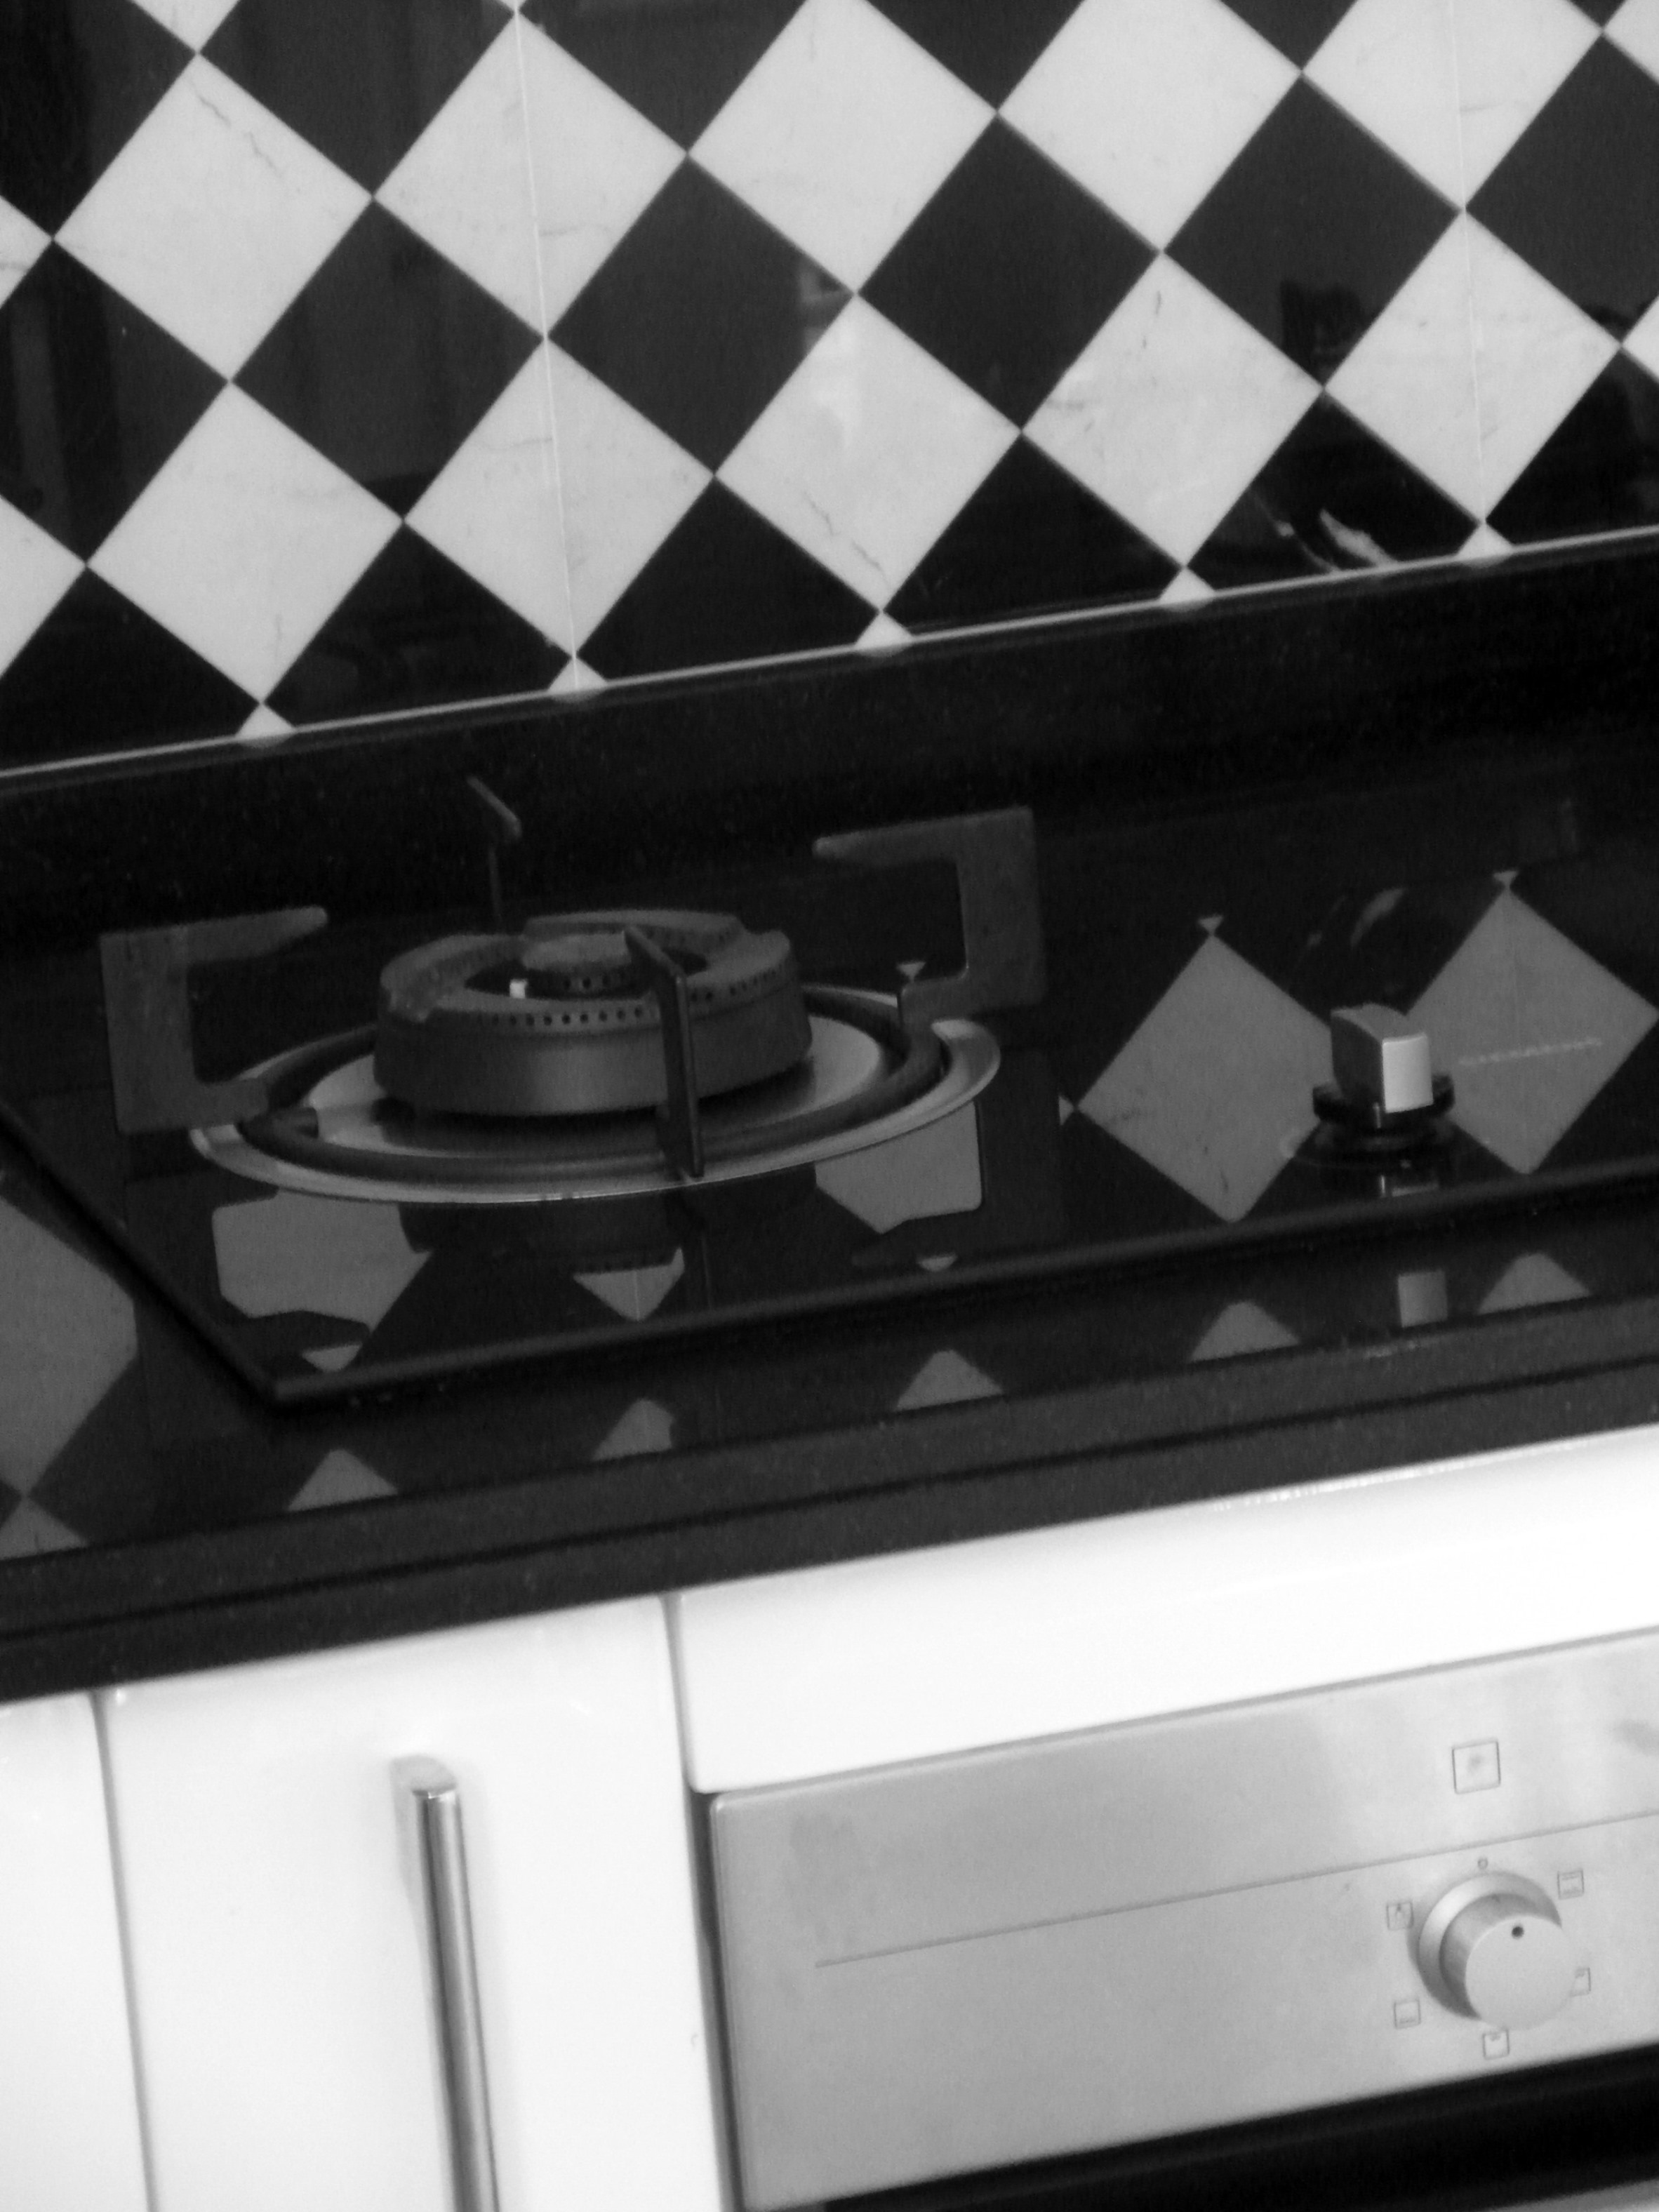 Modern Kitchen Hob, And, Marble, White, Tiles, HQ Photo